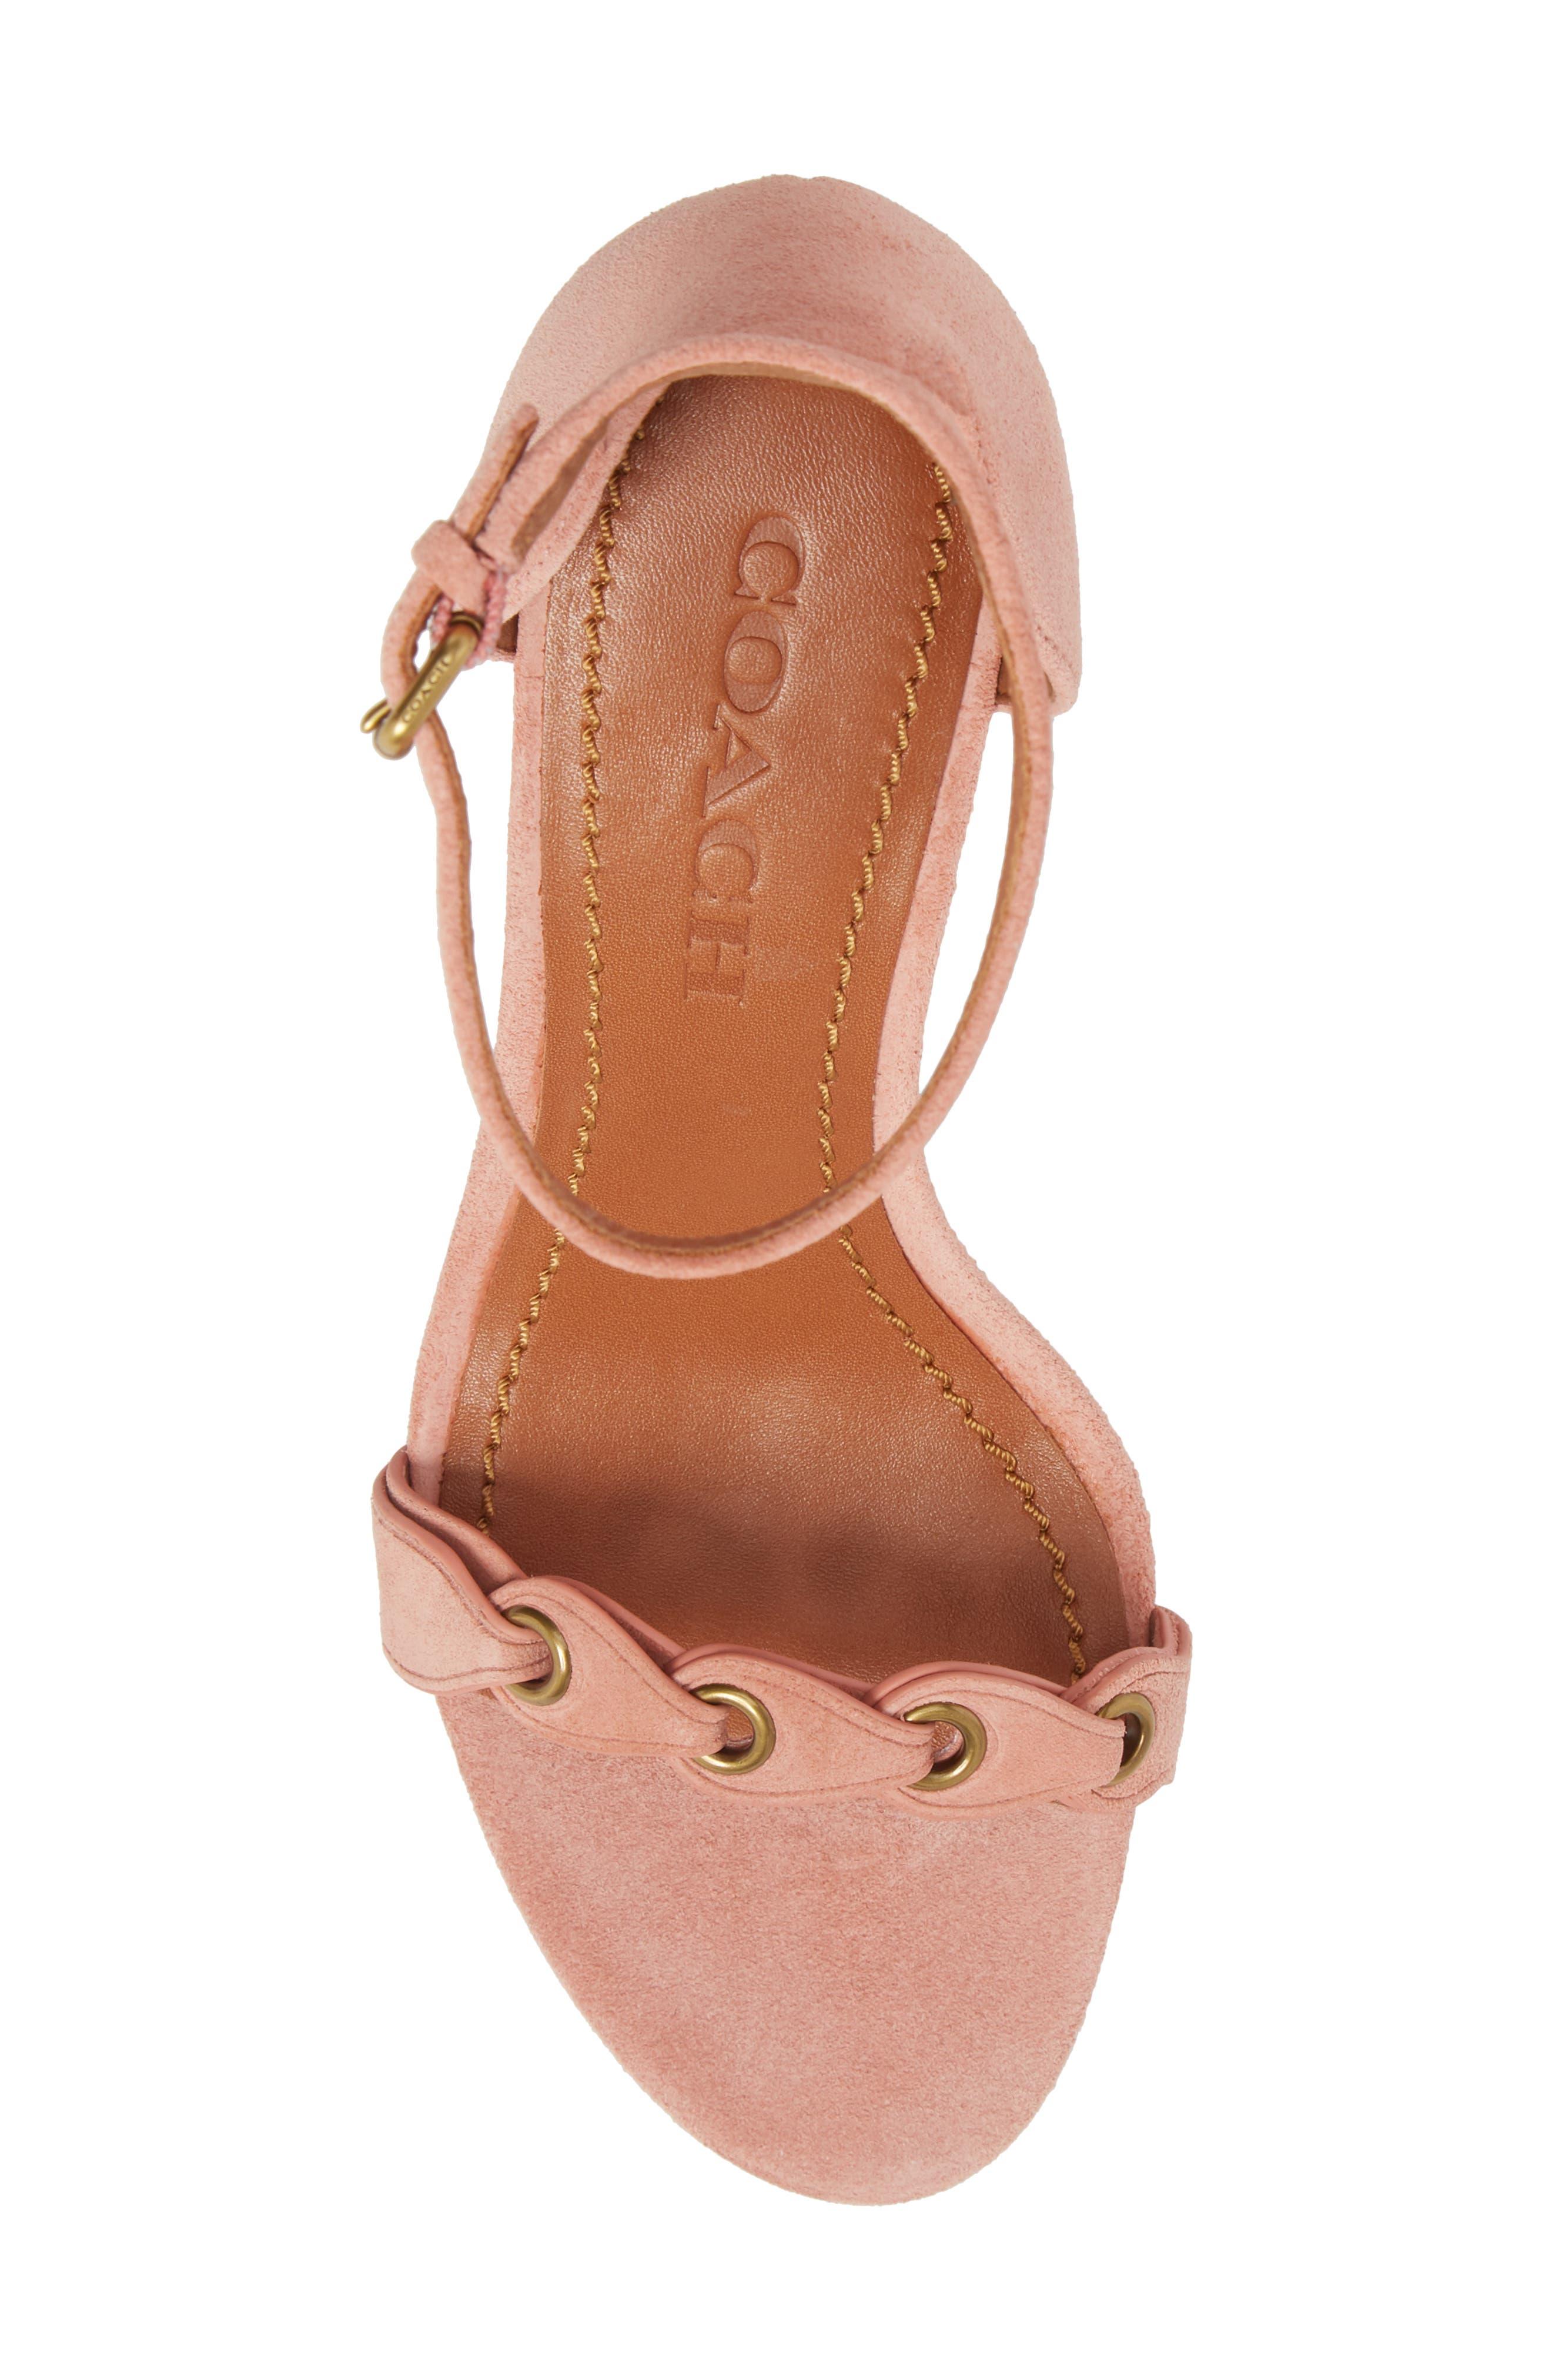 Link Strap Sandal,                             Alternate thumbnail 6, color,                             Peony Leather